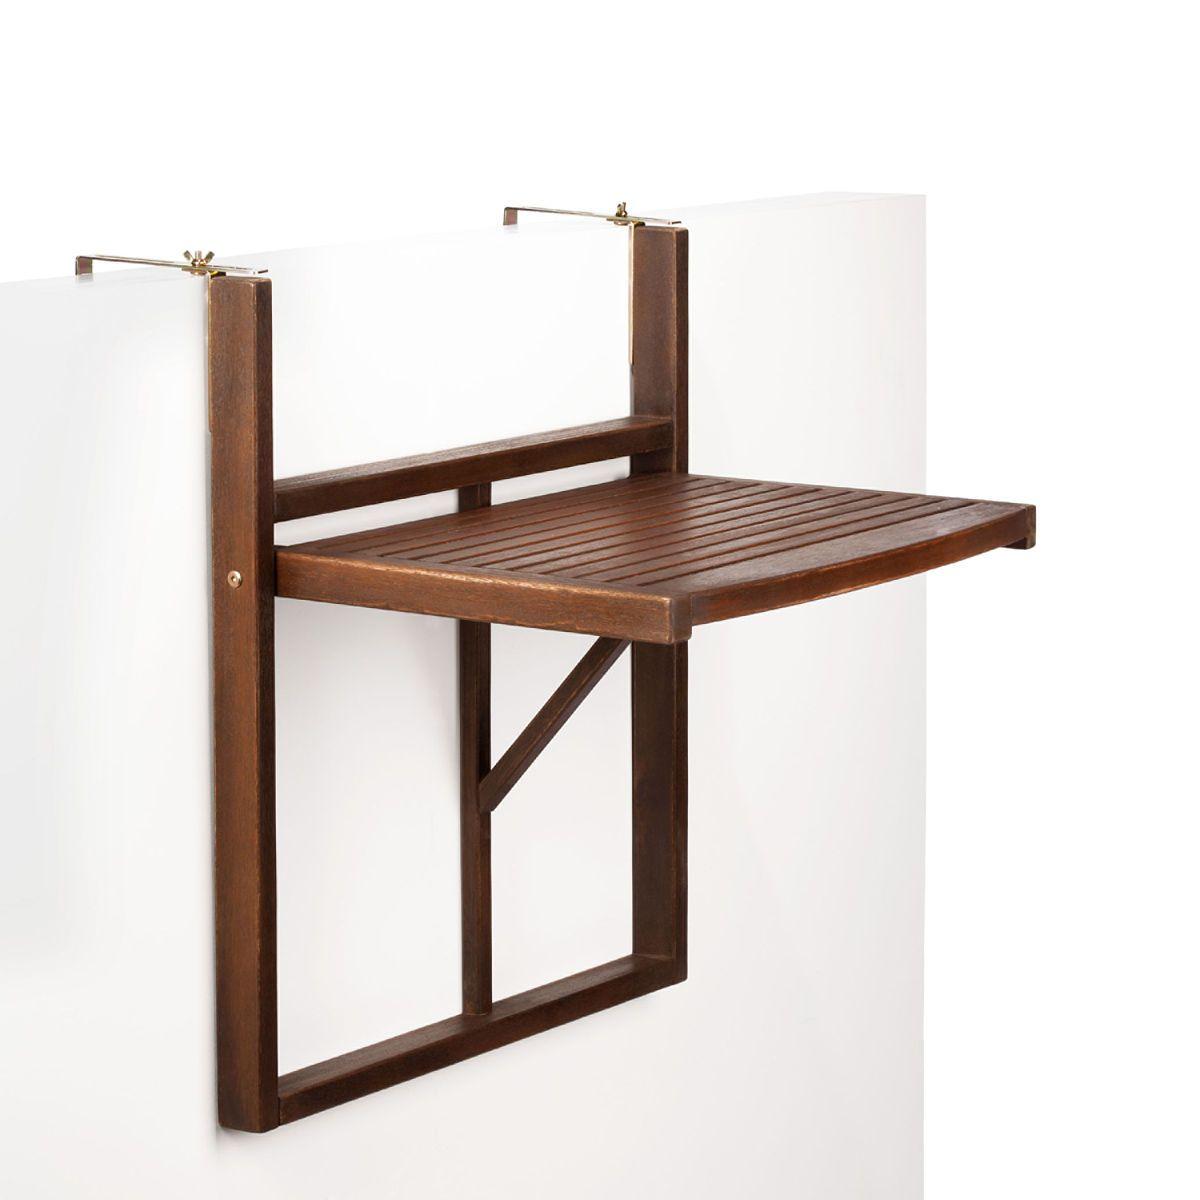 Lodge mesa plegable para barandilla de balc n marr n - Mesa colgante para balcon ...